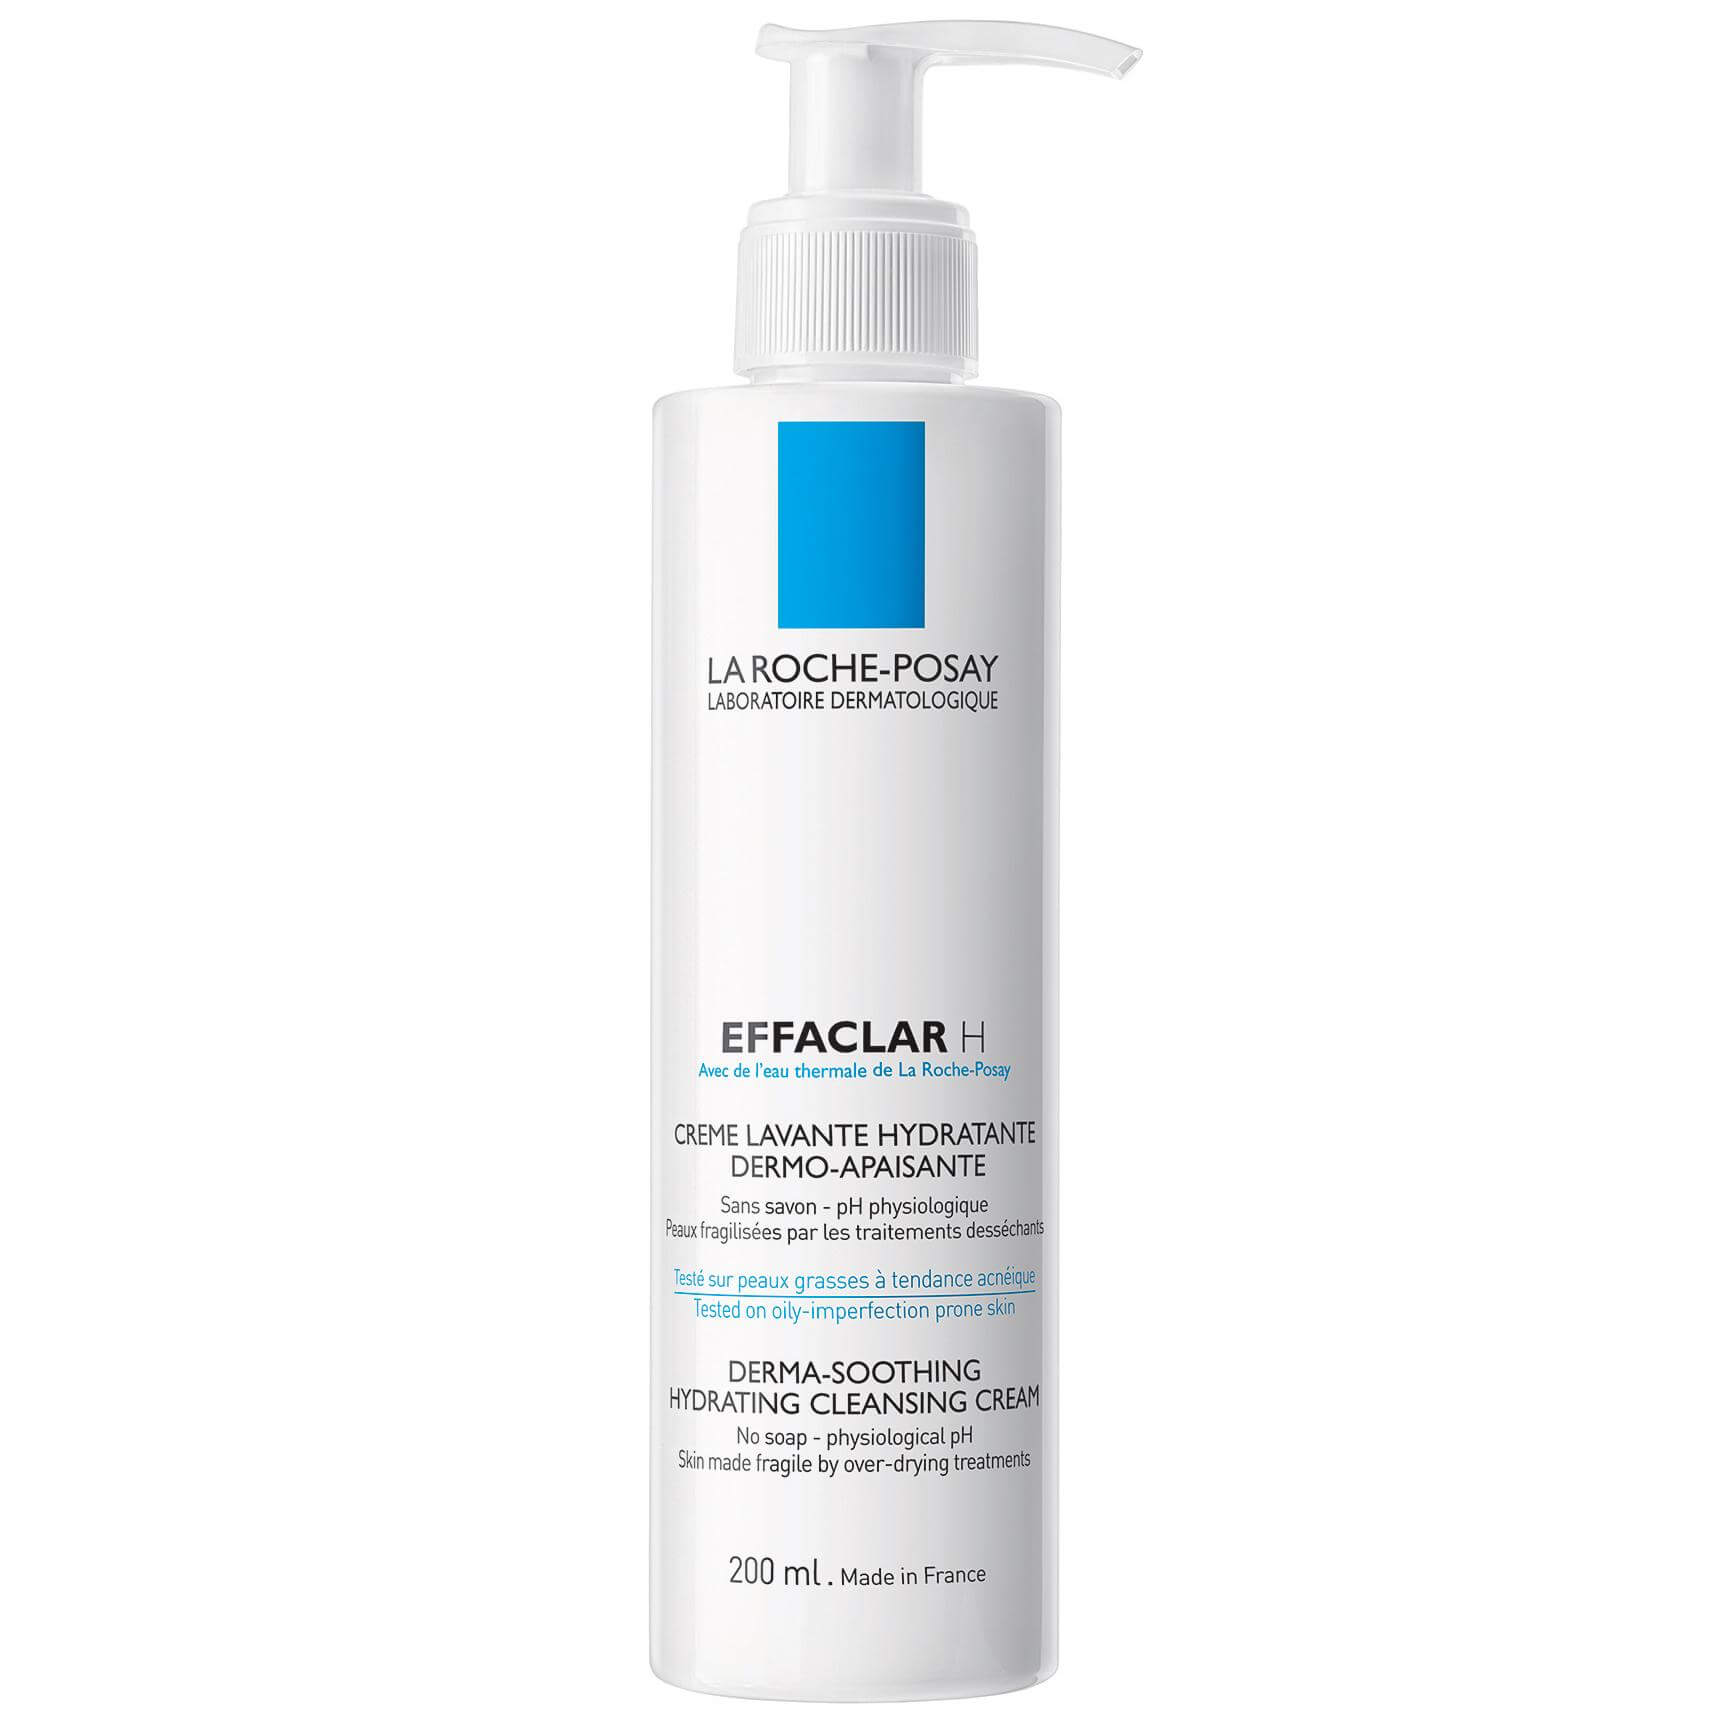 La Roche-Posay Effaclar H Cream Lavante Καταπραϋντική, Eνυδατική Kρέμα Kαθαρισμού Προσώπου με Εξυγιαντικούς Παράγοντες 200ml